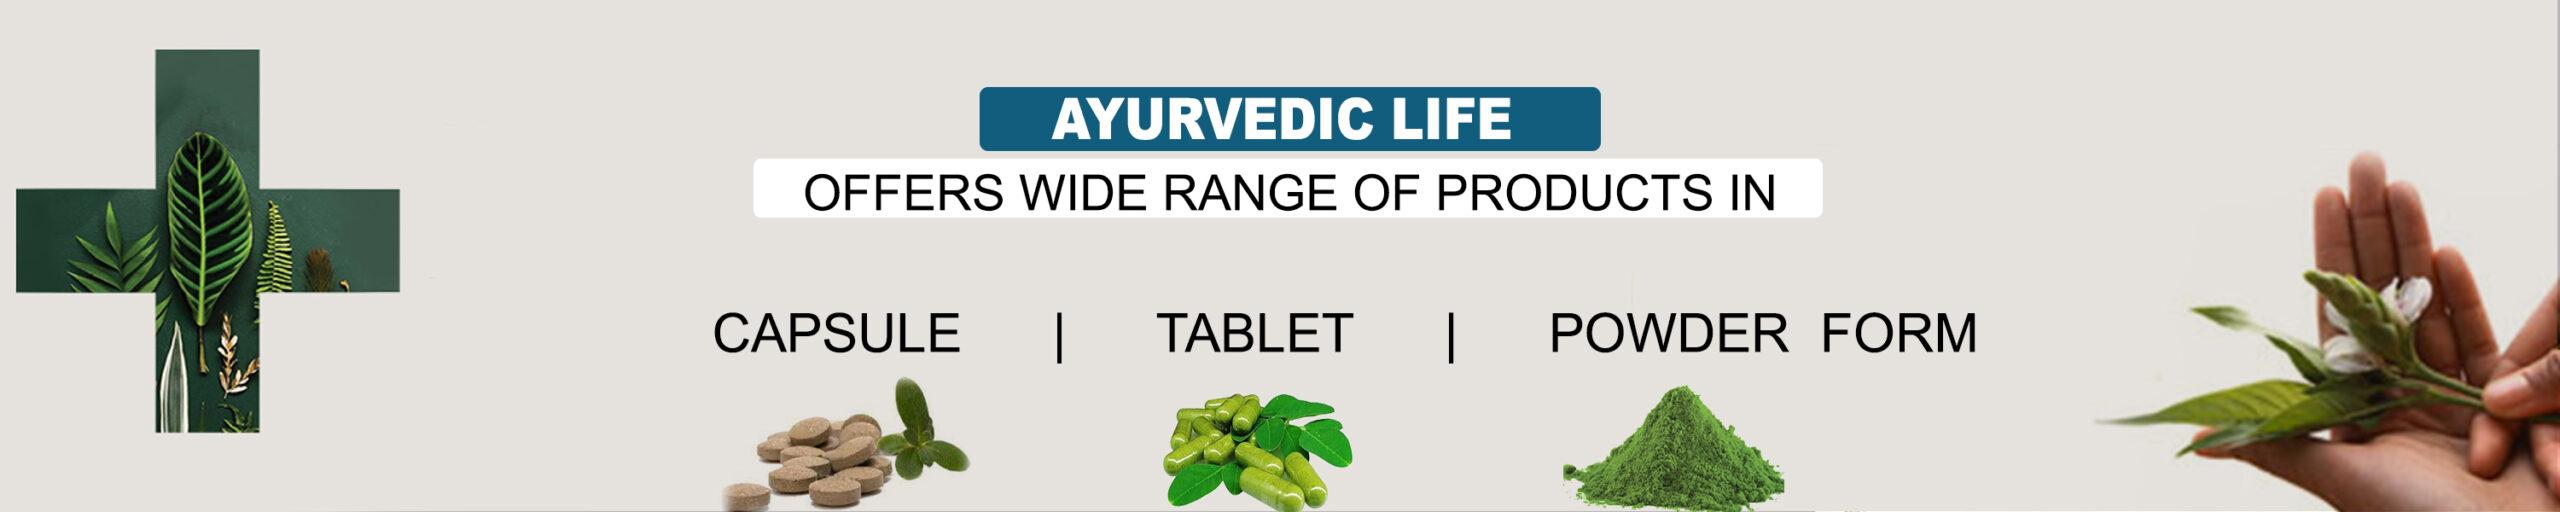 Ayurvedic Life product range